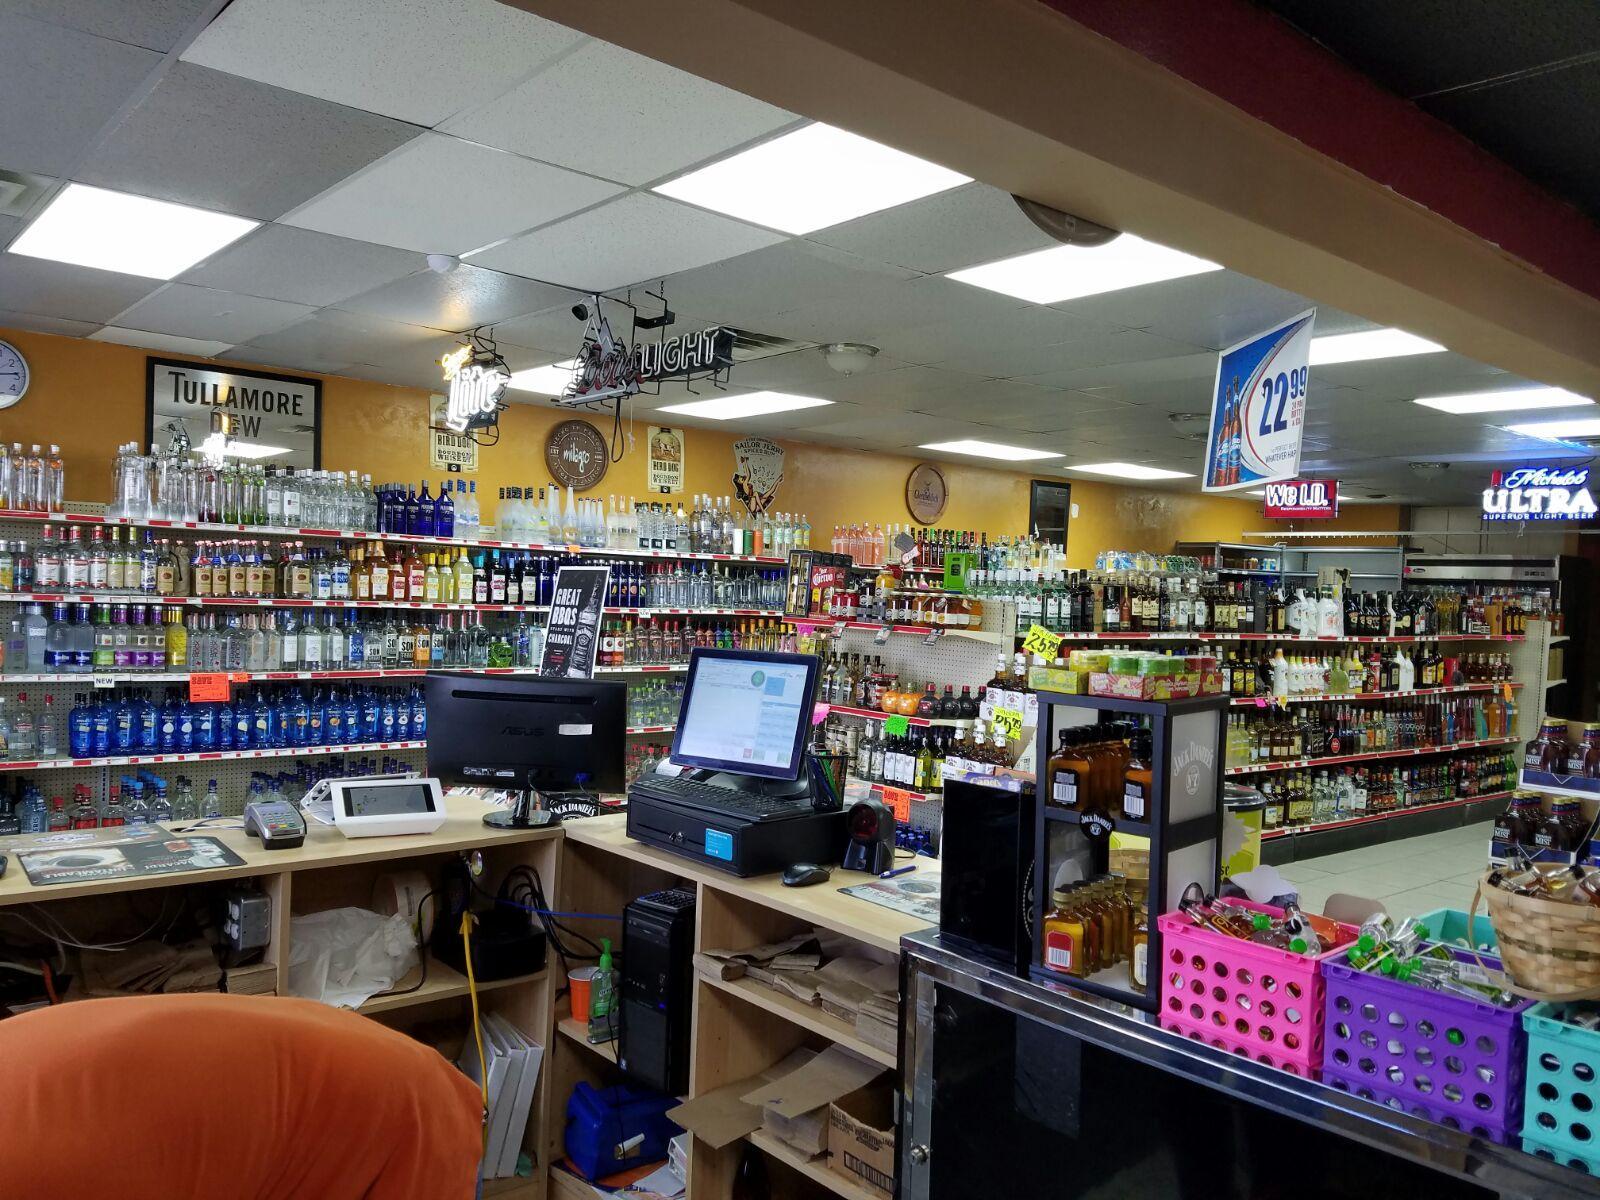 Sams Wholesale Priced Liquor Grand Liquor Shop Doing business as:sams wholesale car's inc sam's wholesale car's, inc. grand liquor